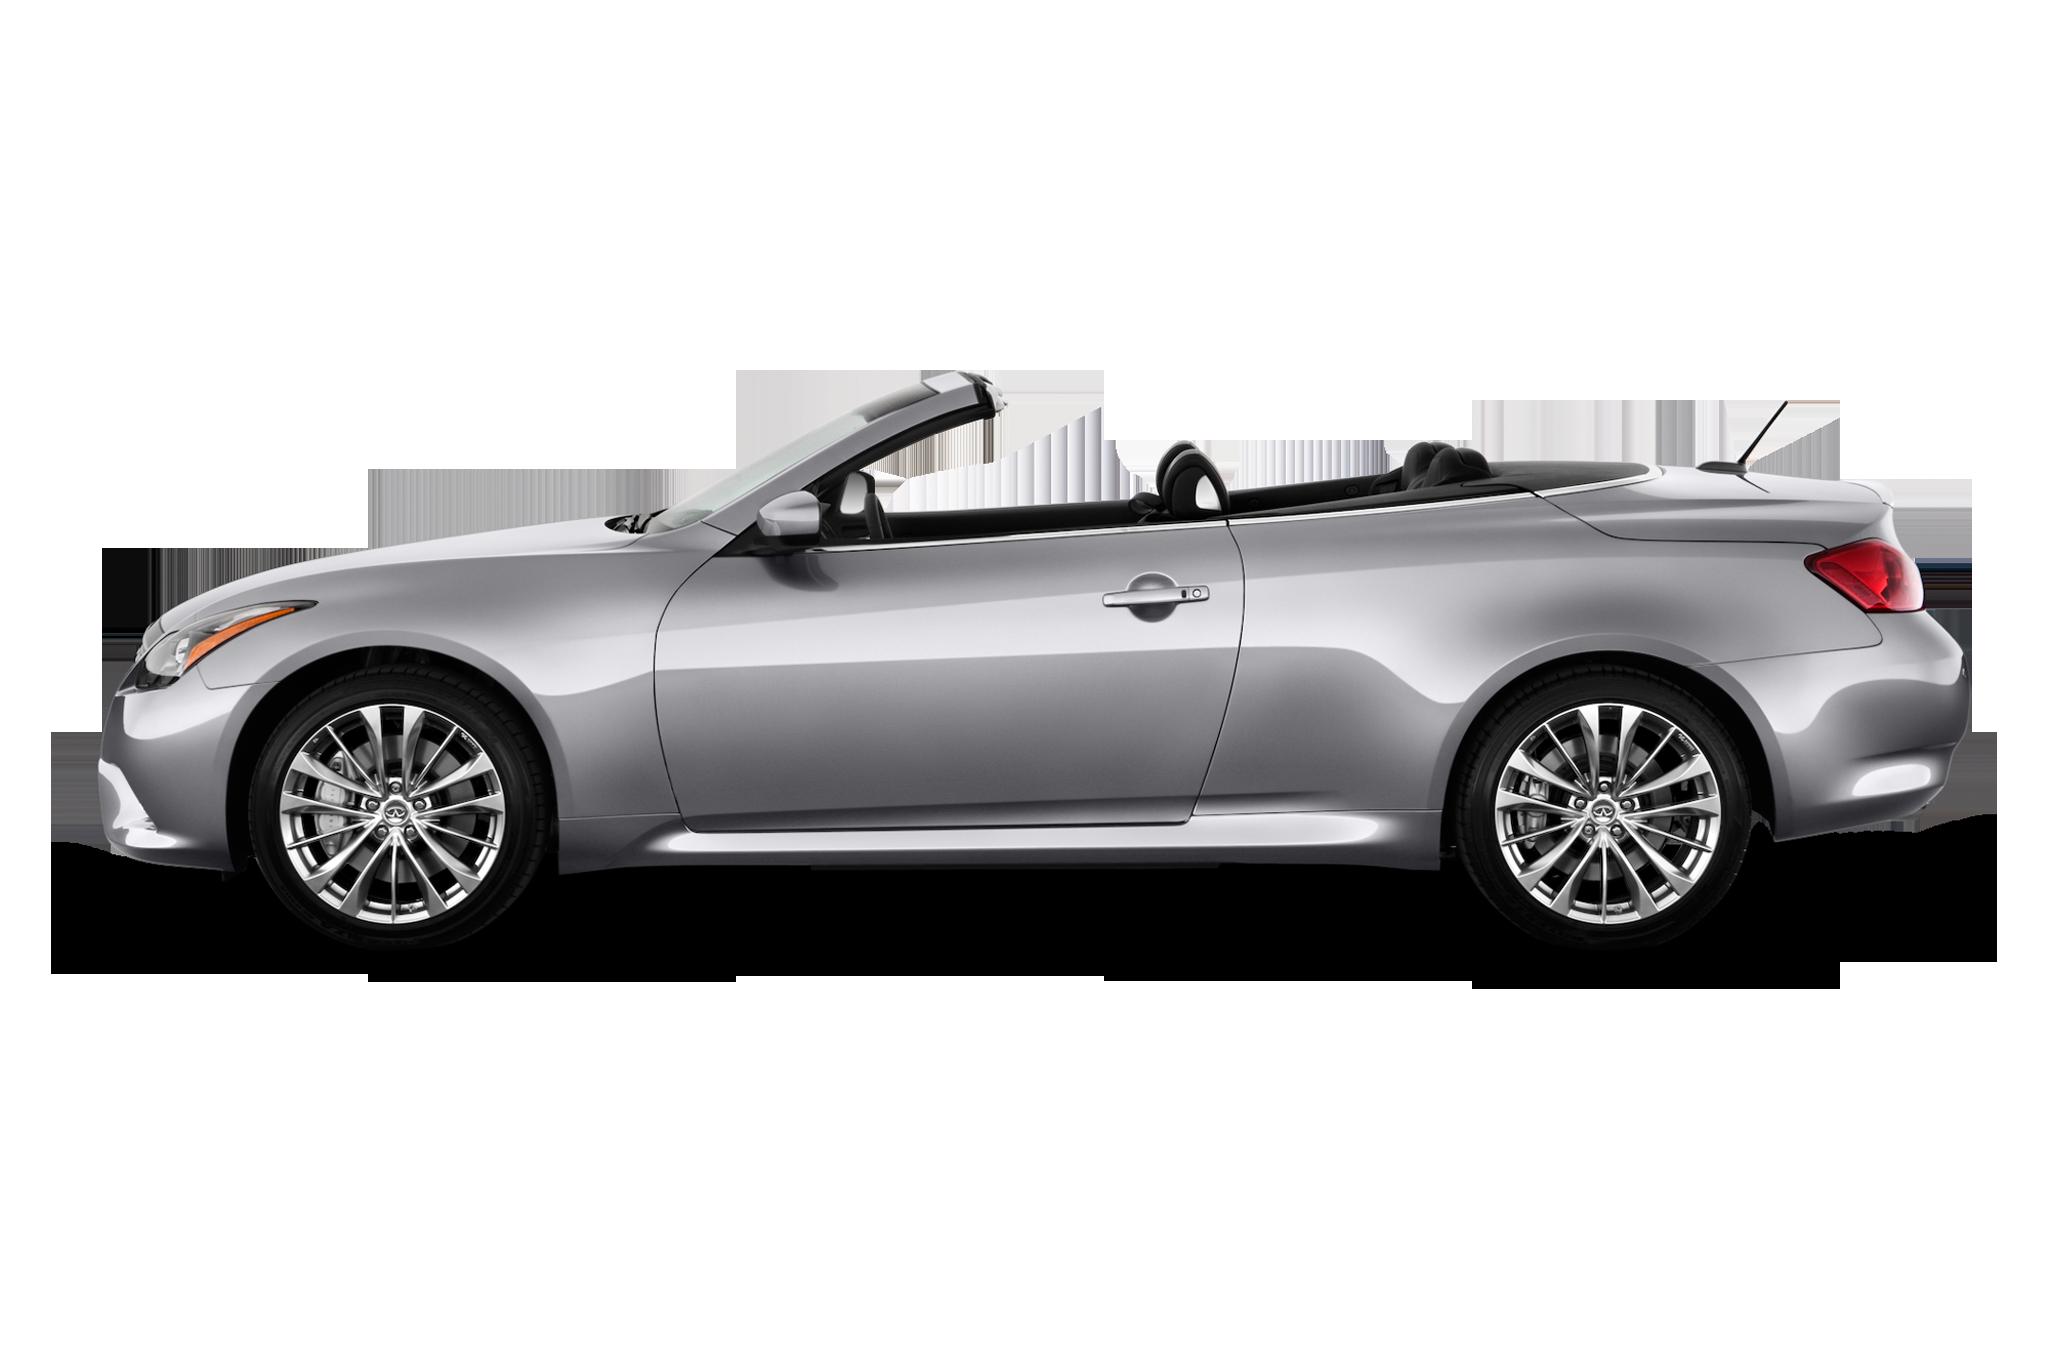 2011 Infiniti IPL G Coupe First Drive Automobile Magazine